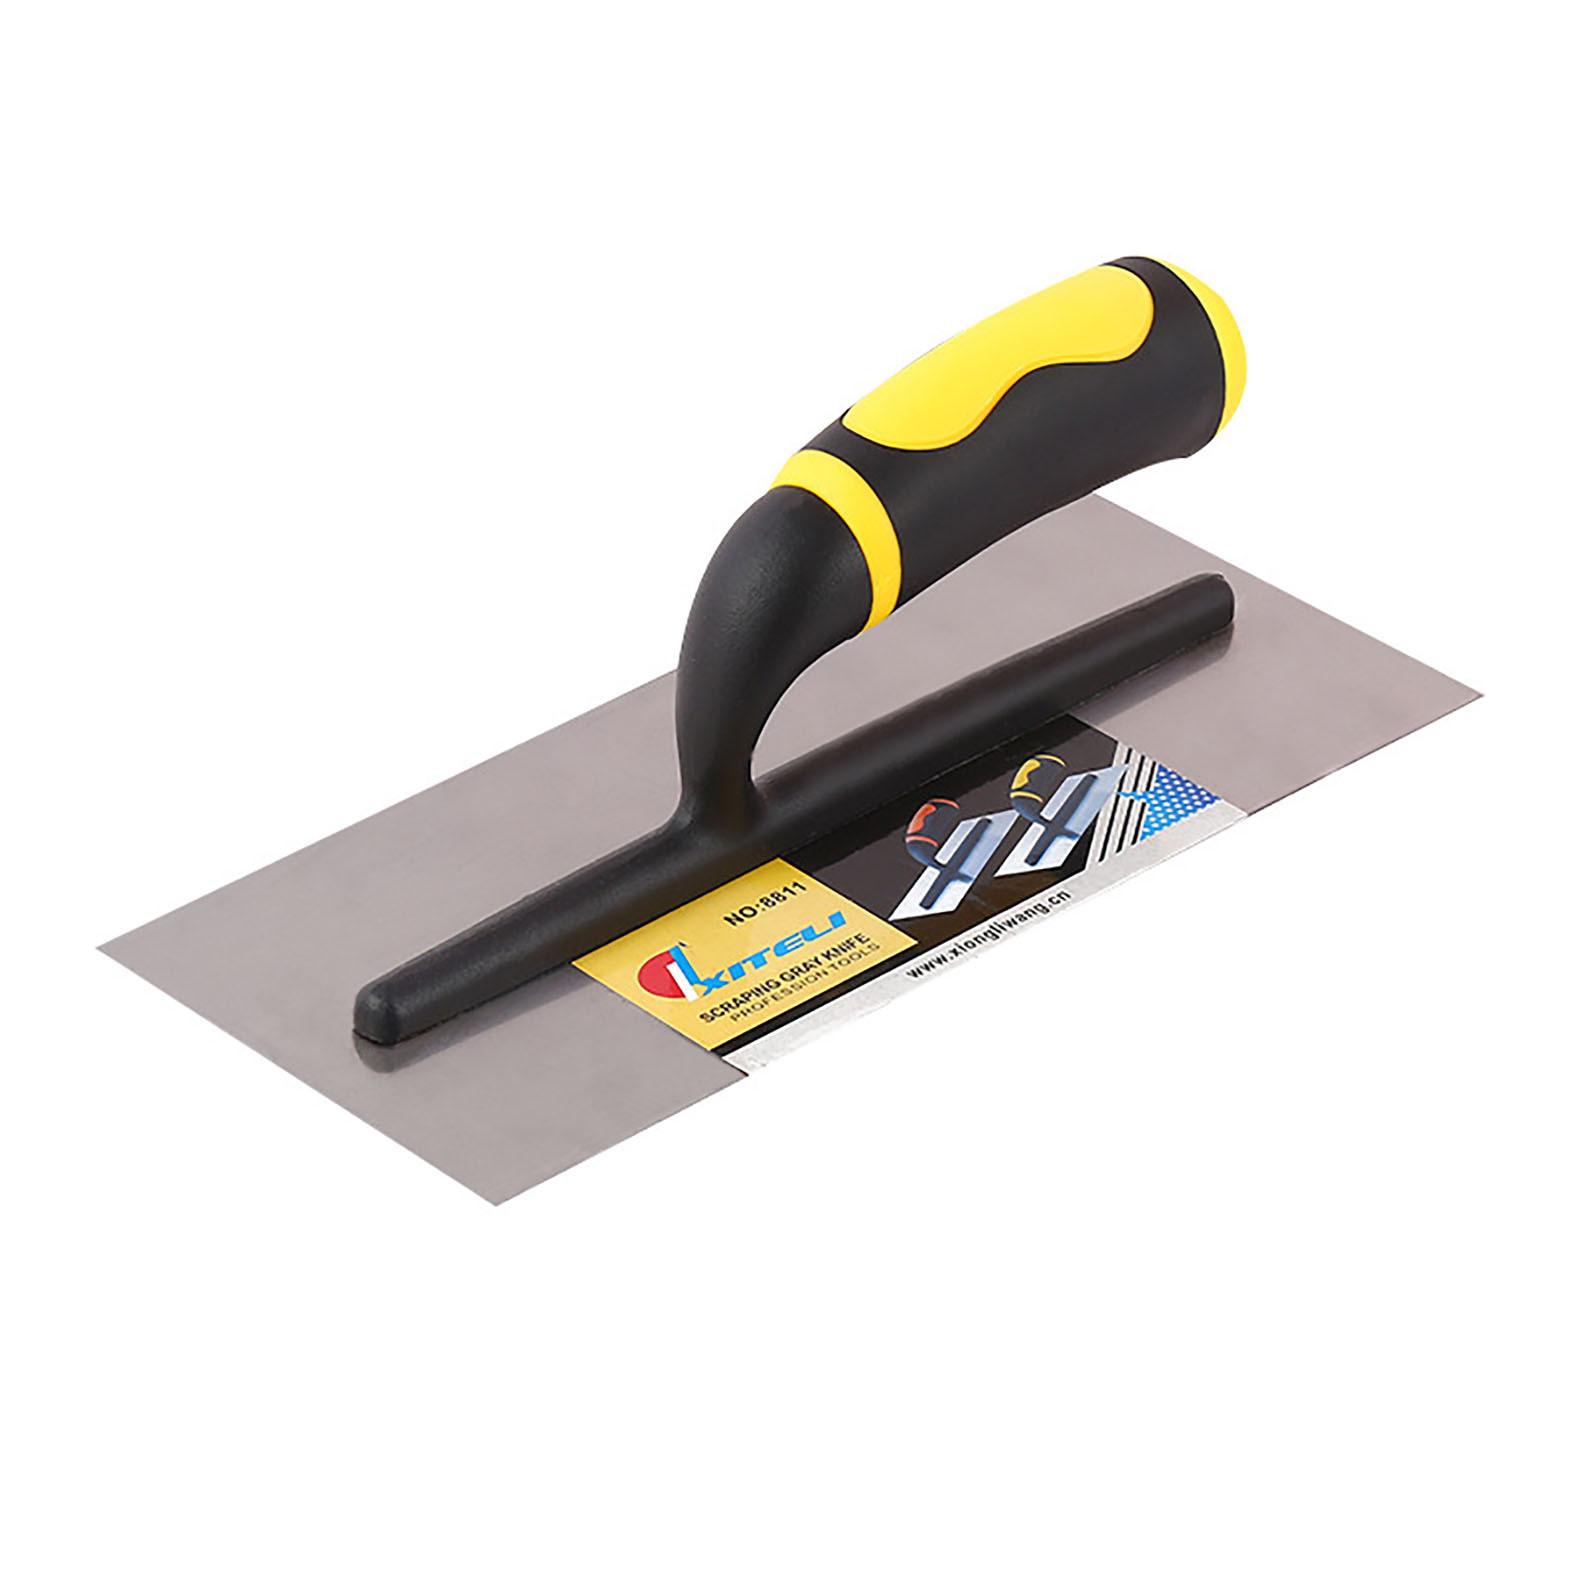 Decorating trowel steel square flat trowel plastic handle shovel trowel craftsman tool clay trowel s